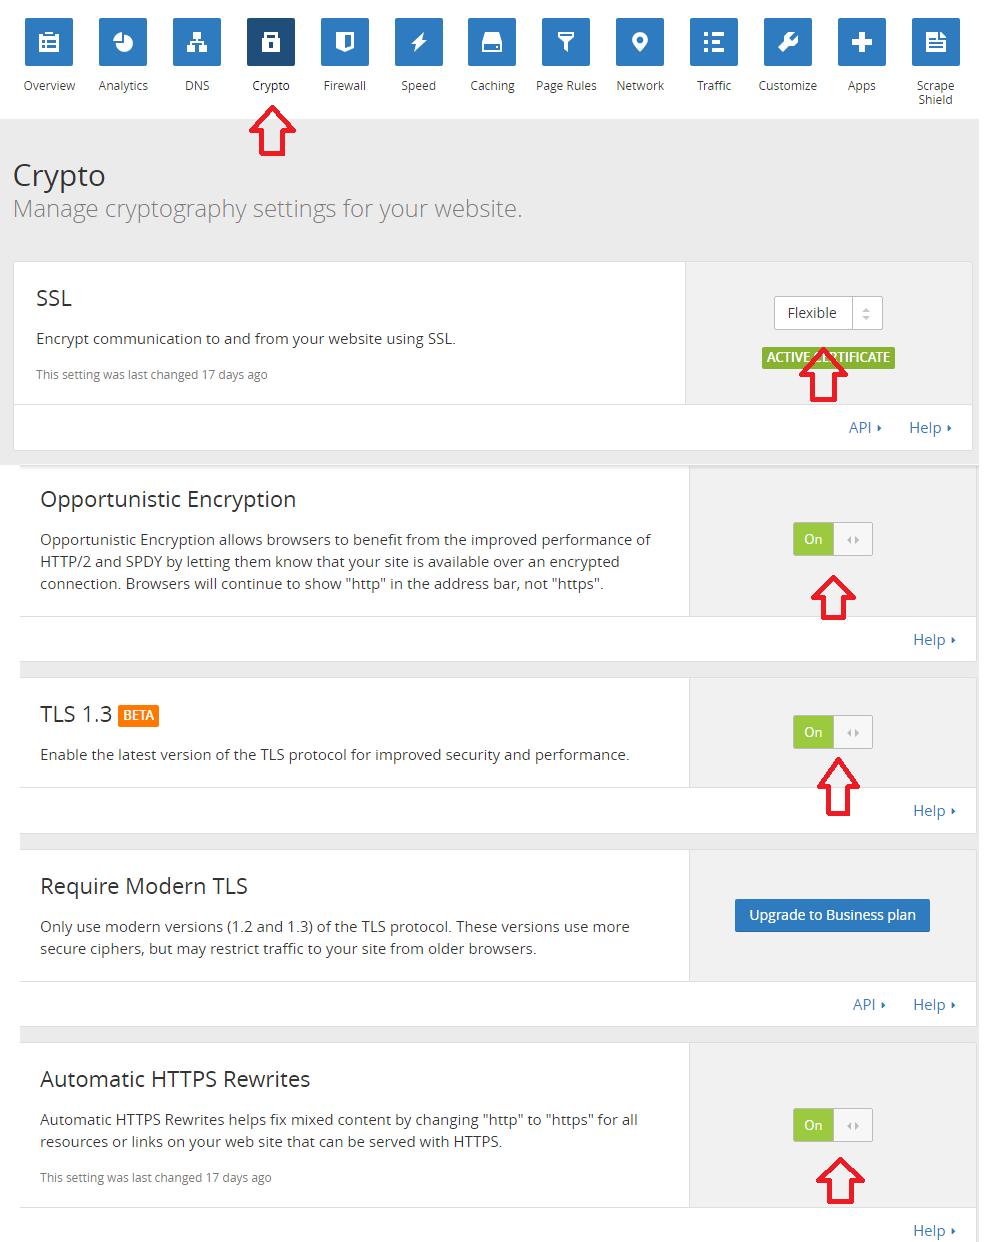 cara mengaktifkan Flexible SSL pada Cloudflare